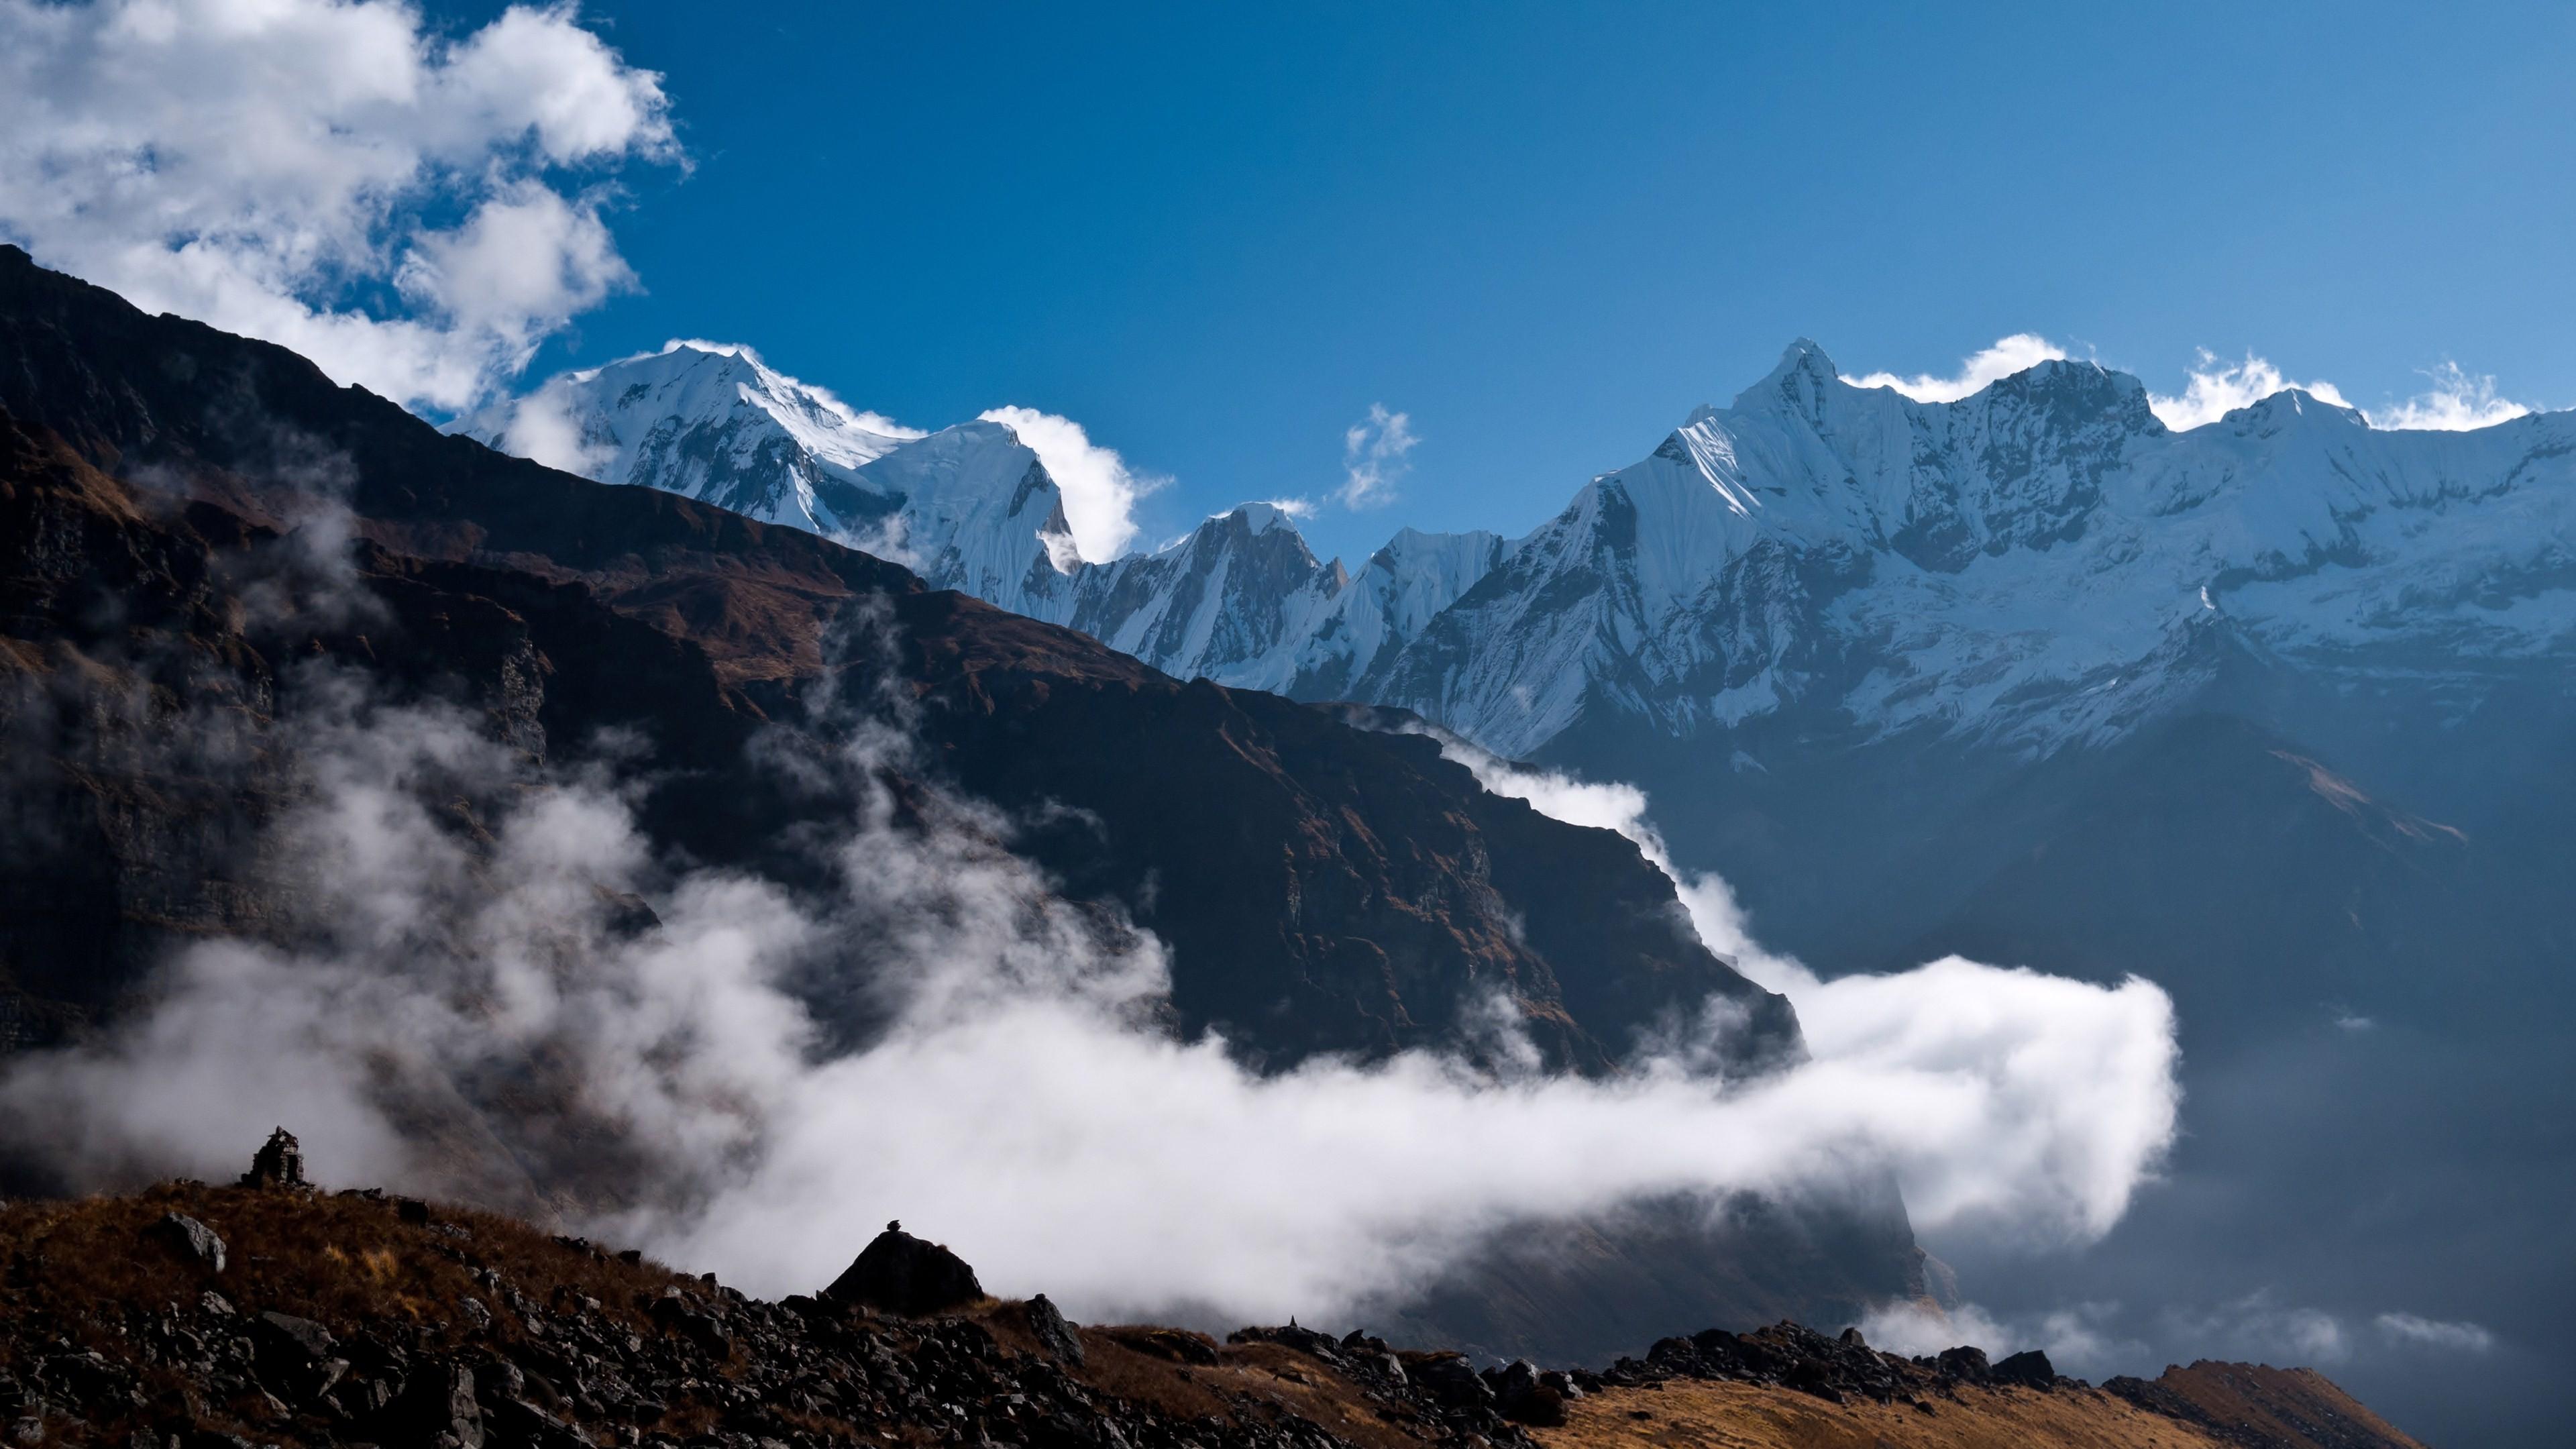 mountain wallpaper pack 1080p hd – mountain category